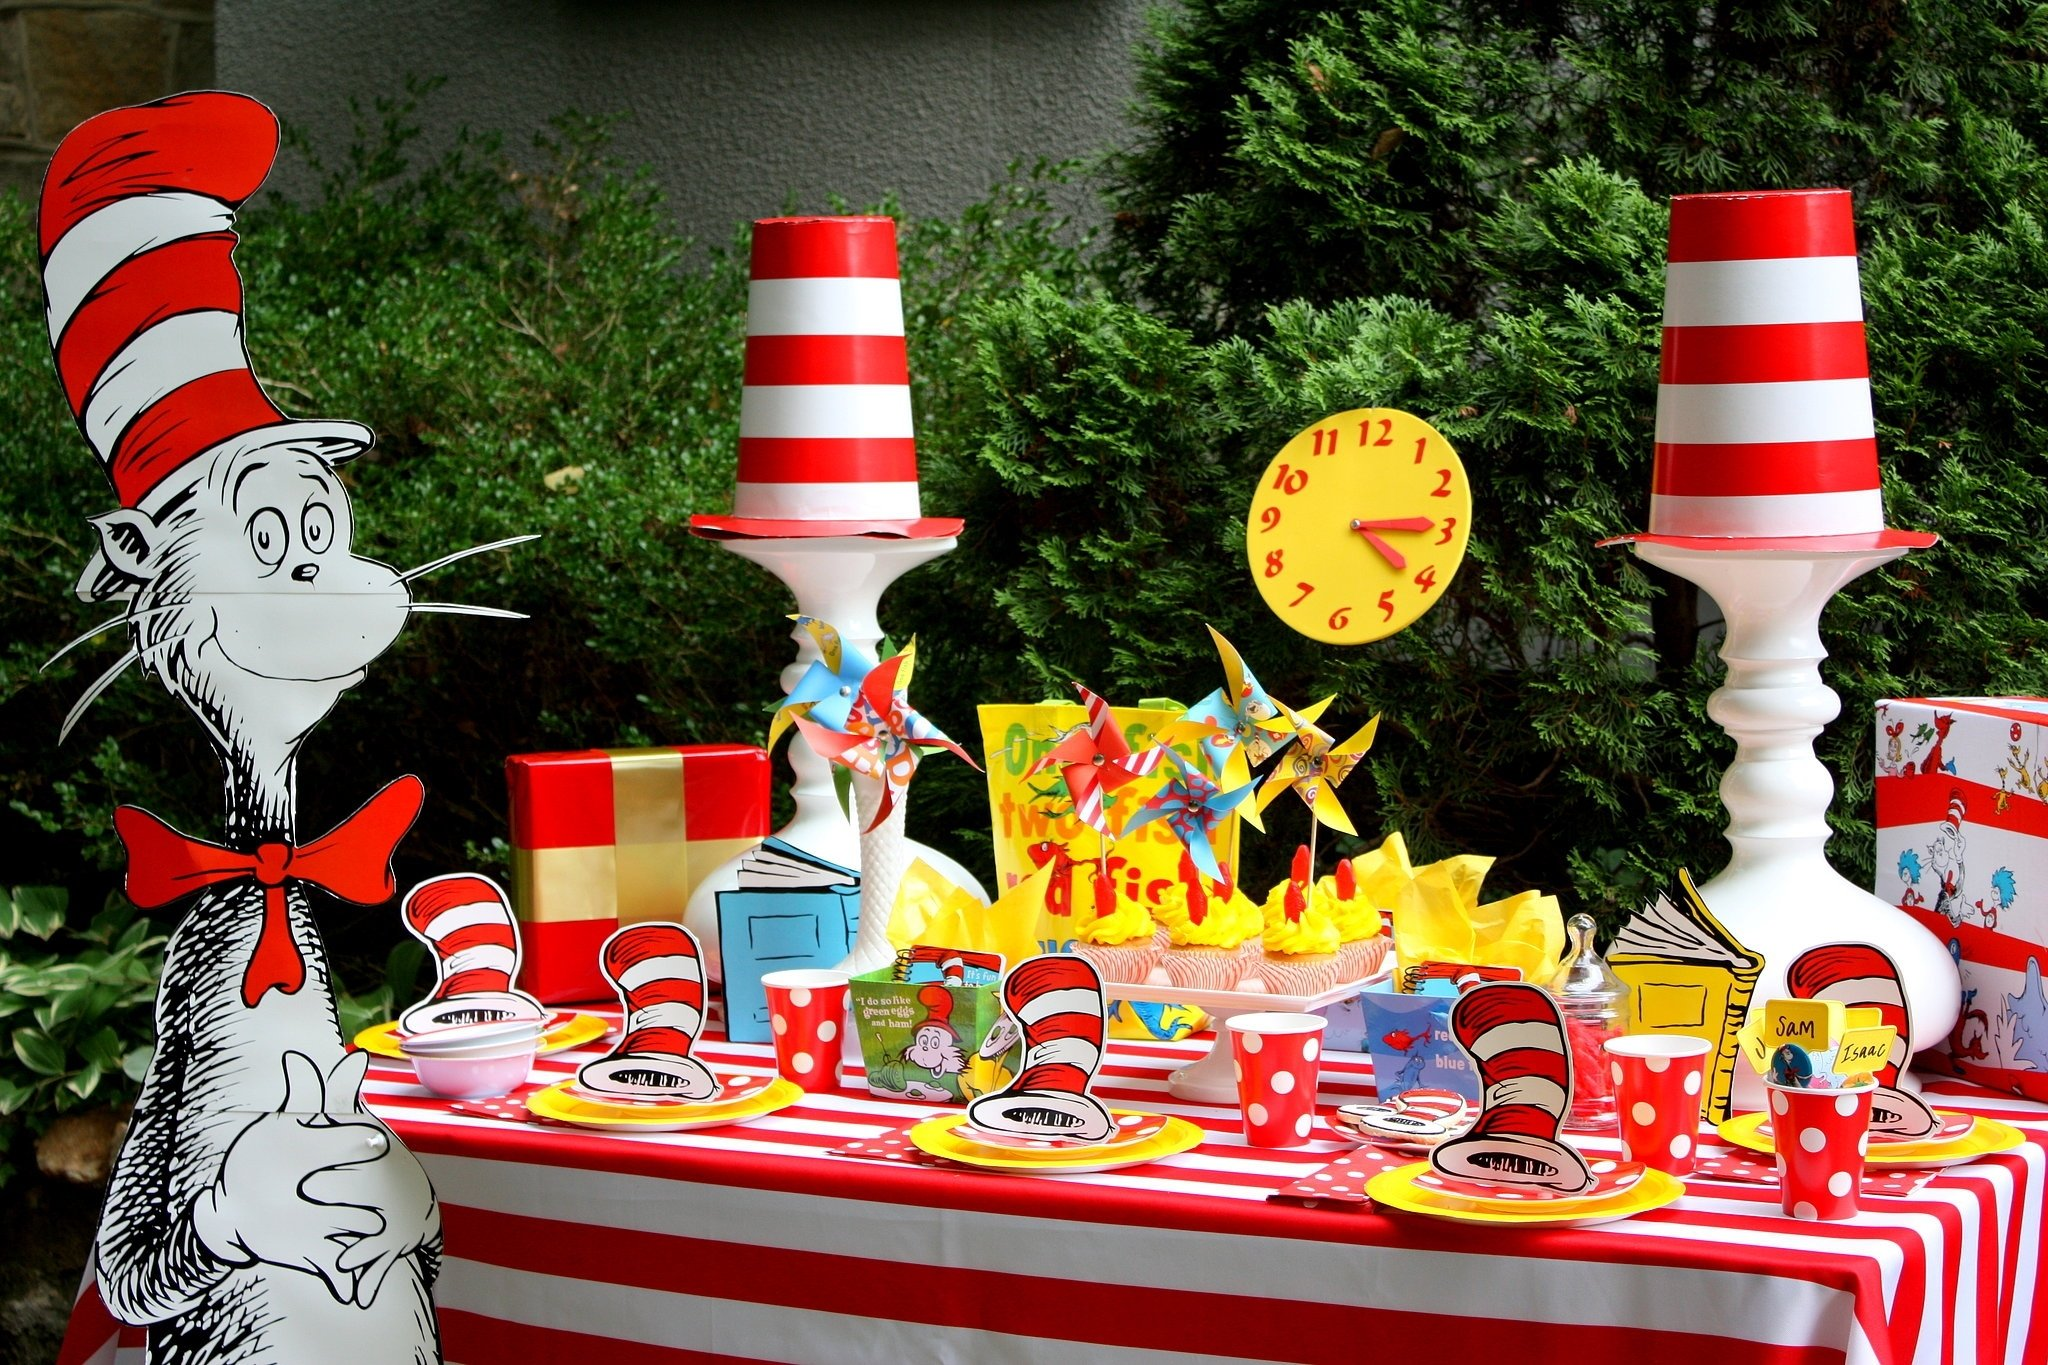 10 Stylish Ideas For Dr. Seuss Day dr seuss birthday party ideas free printables savvy nana 1 2020